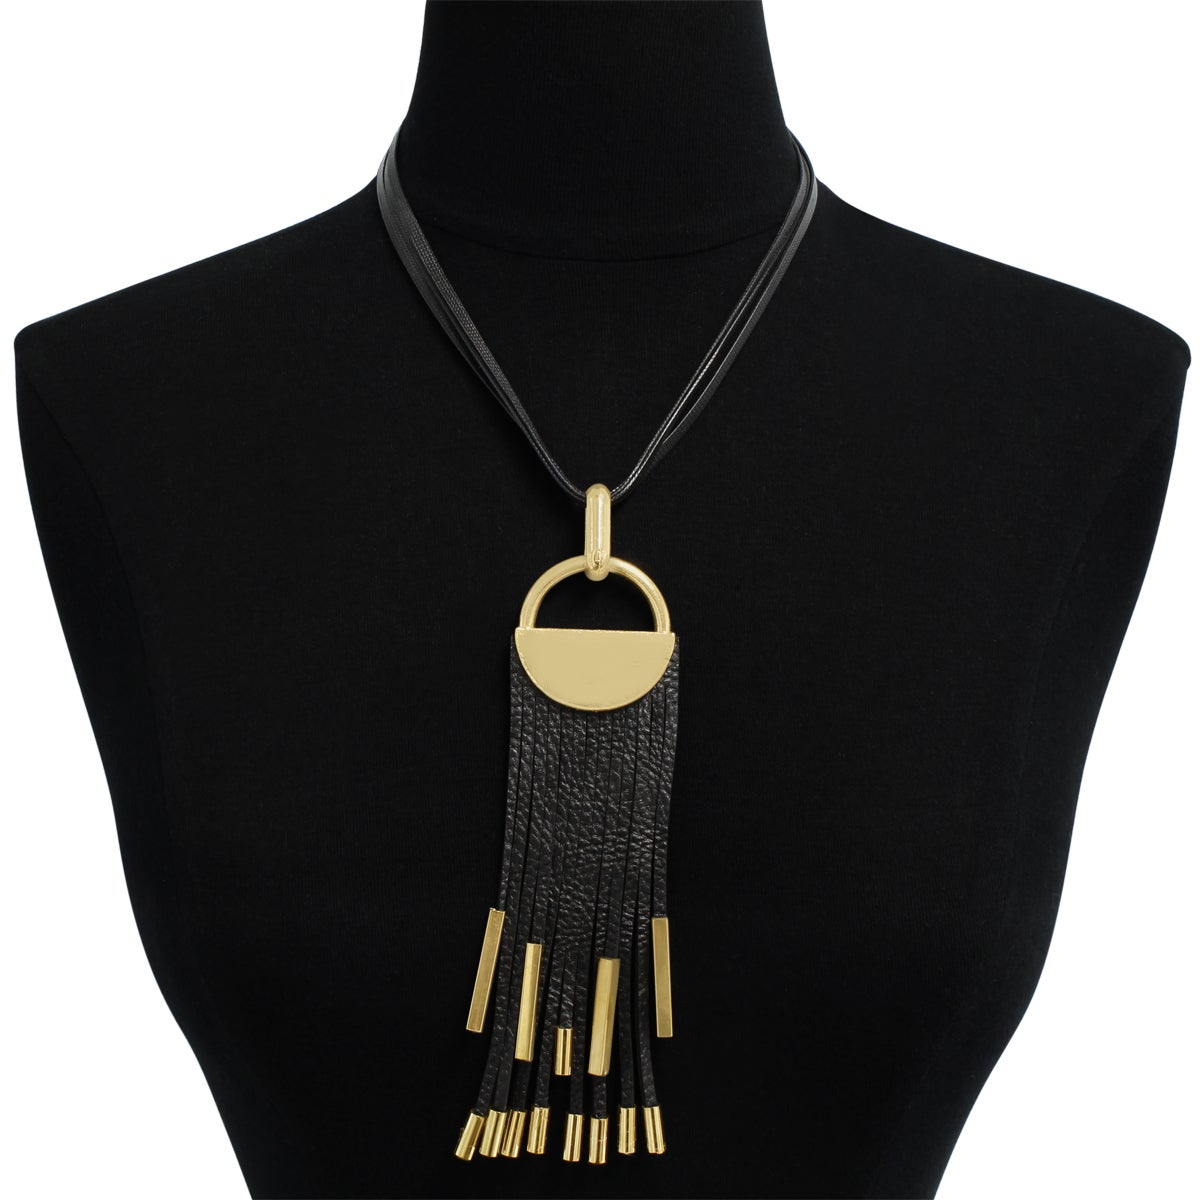 Shop Black Vegan Leather Gold Over Brass Statement Necklace Free